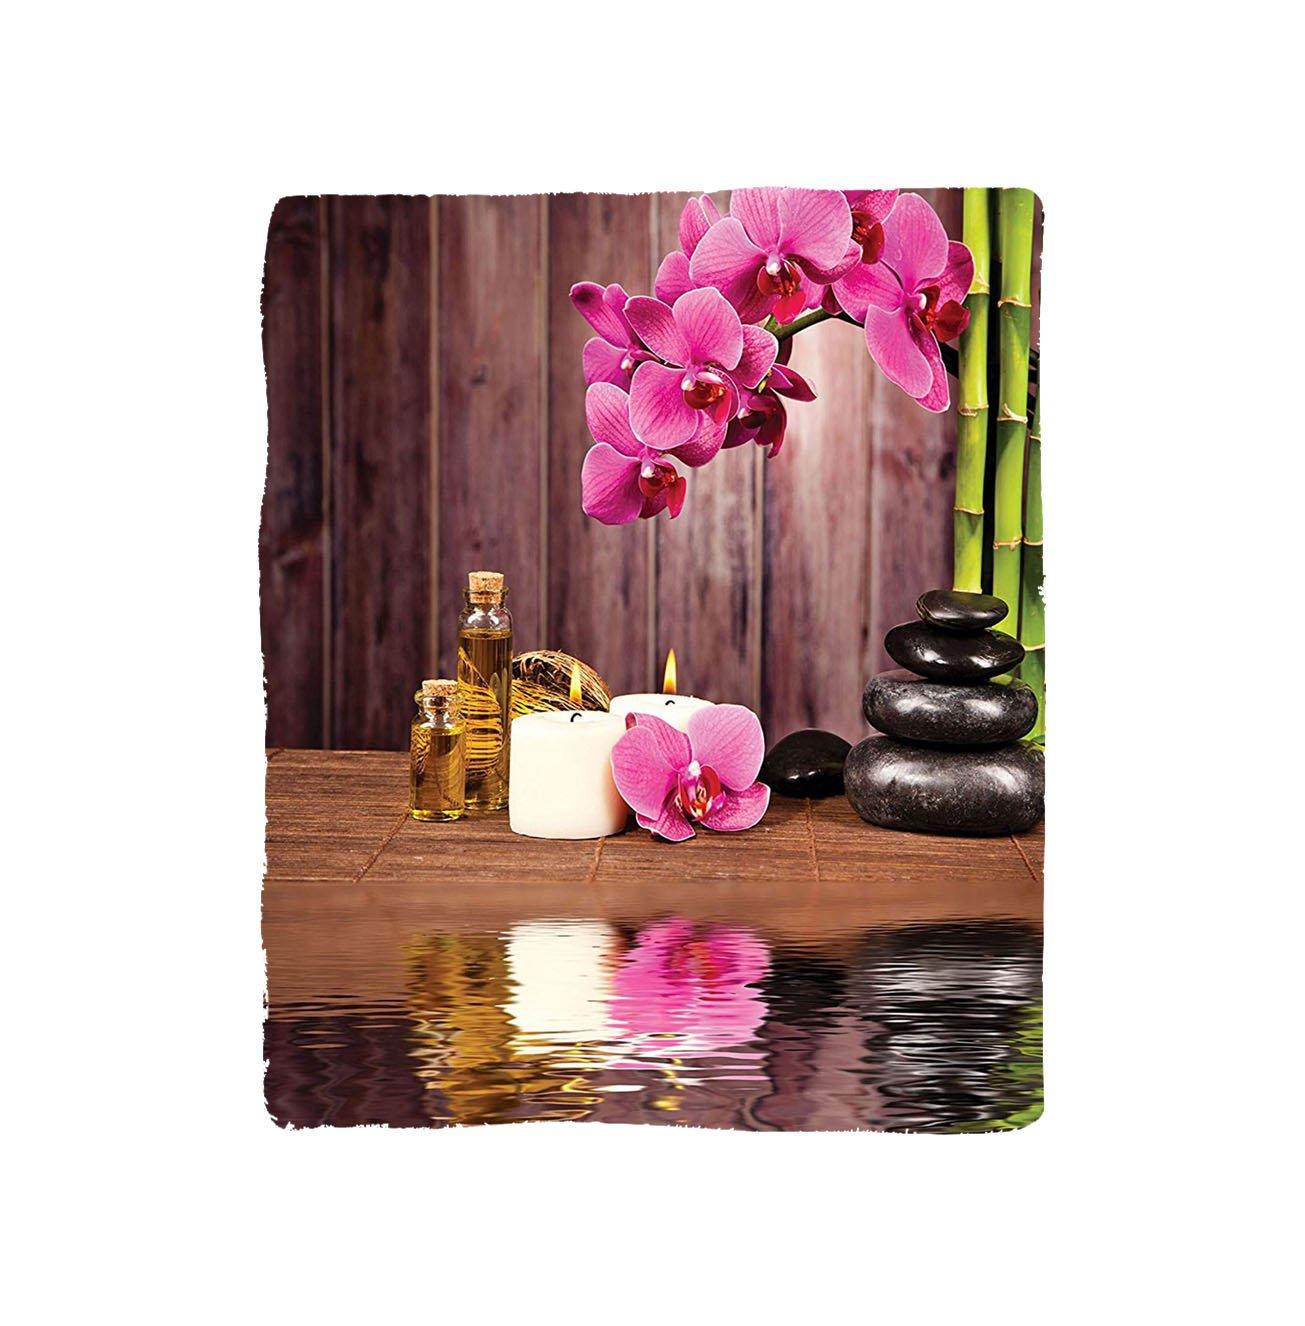 VROSELV Custom Blanket Spa Spa Flower Water Reflection Aromatherapy Bamboo Blossom Candlelight Bedroom Living Room Dorm